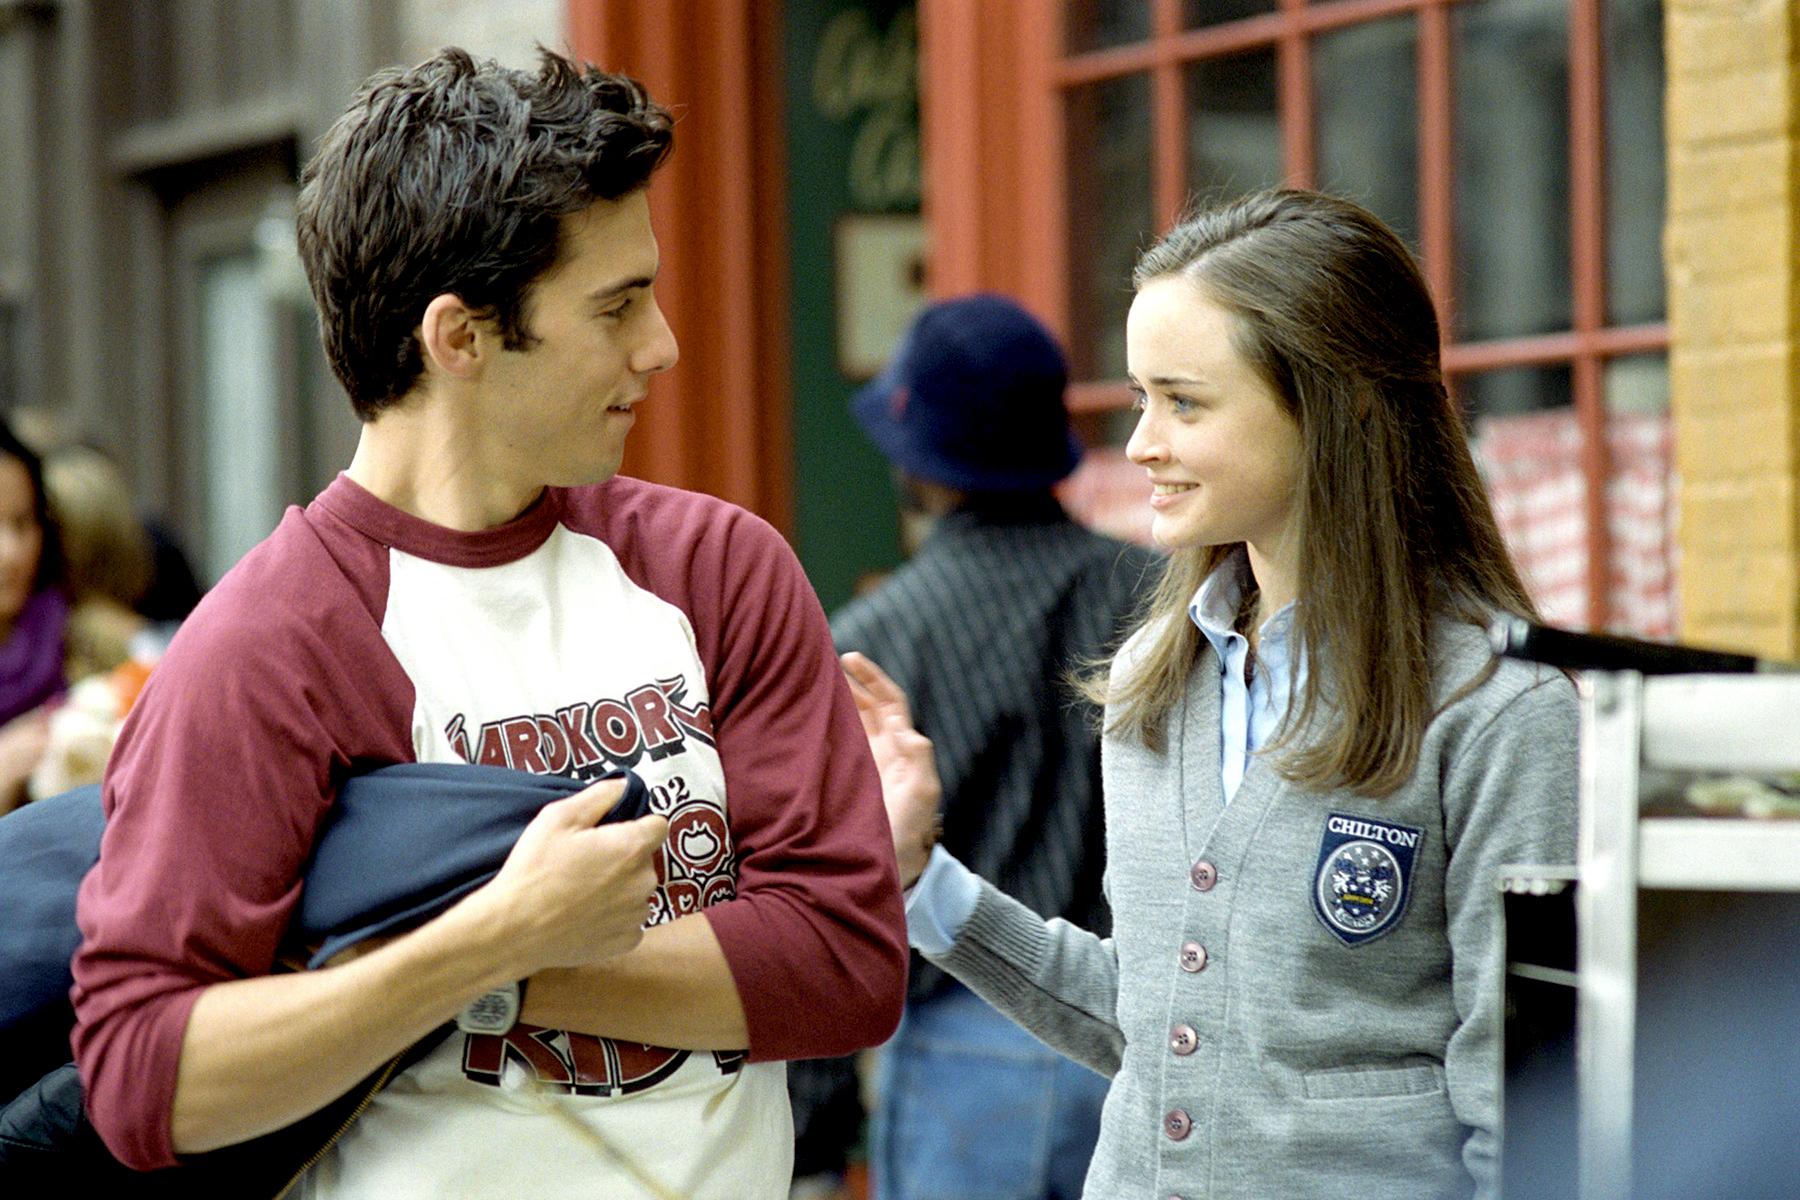 Milo Ventimiglia and Alexis Bledel in Gilmore Girls.